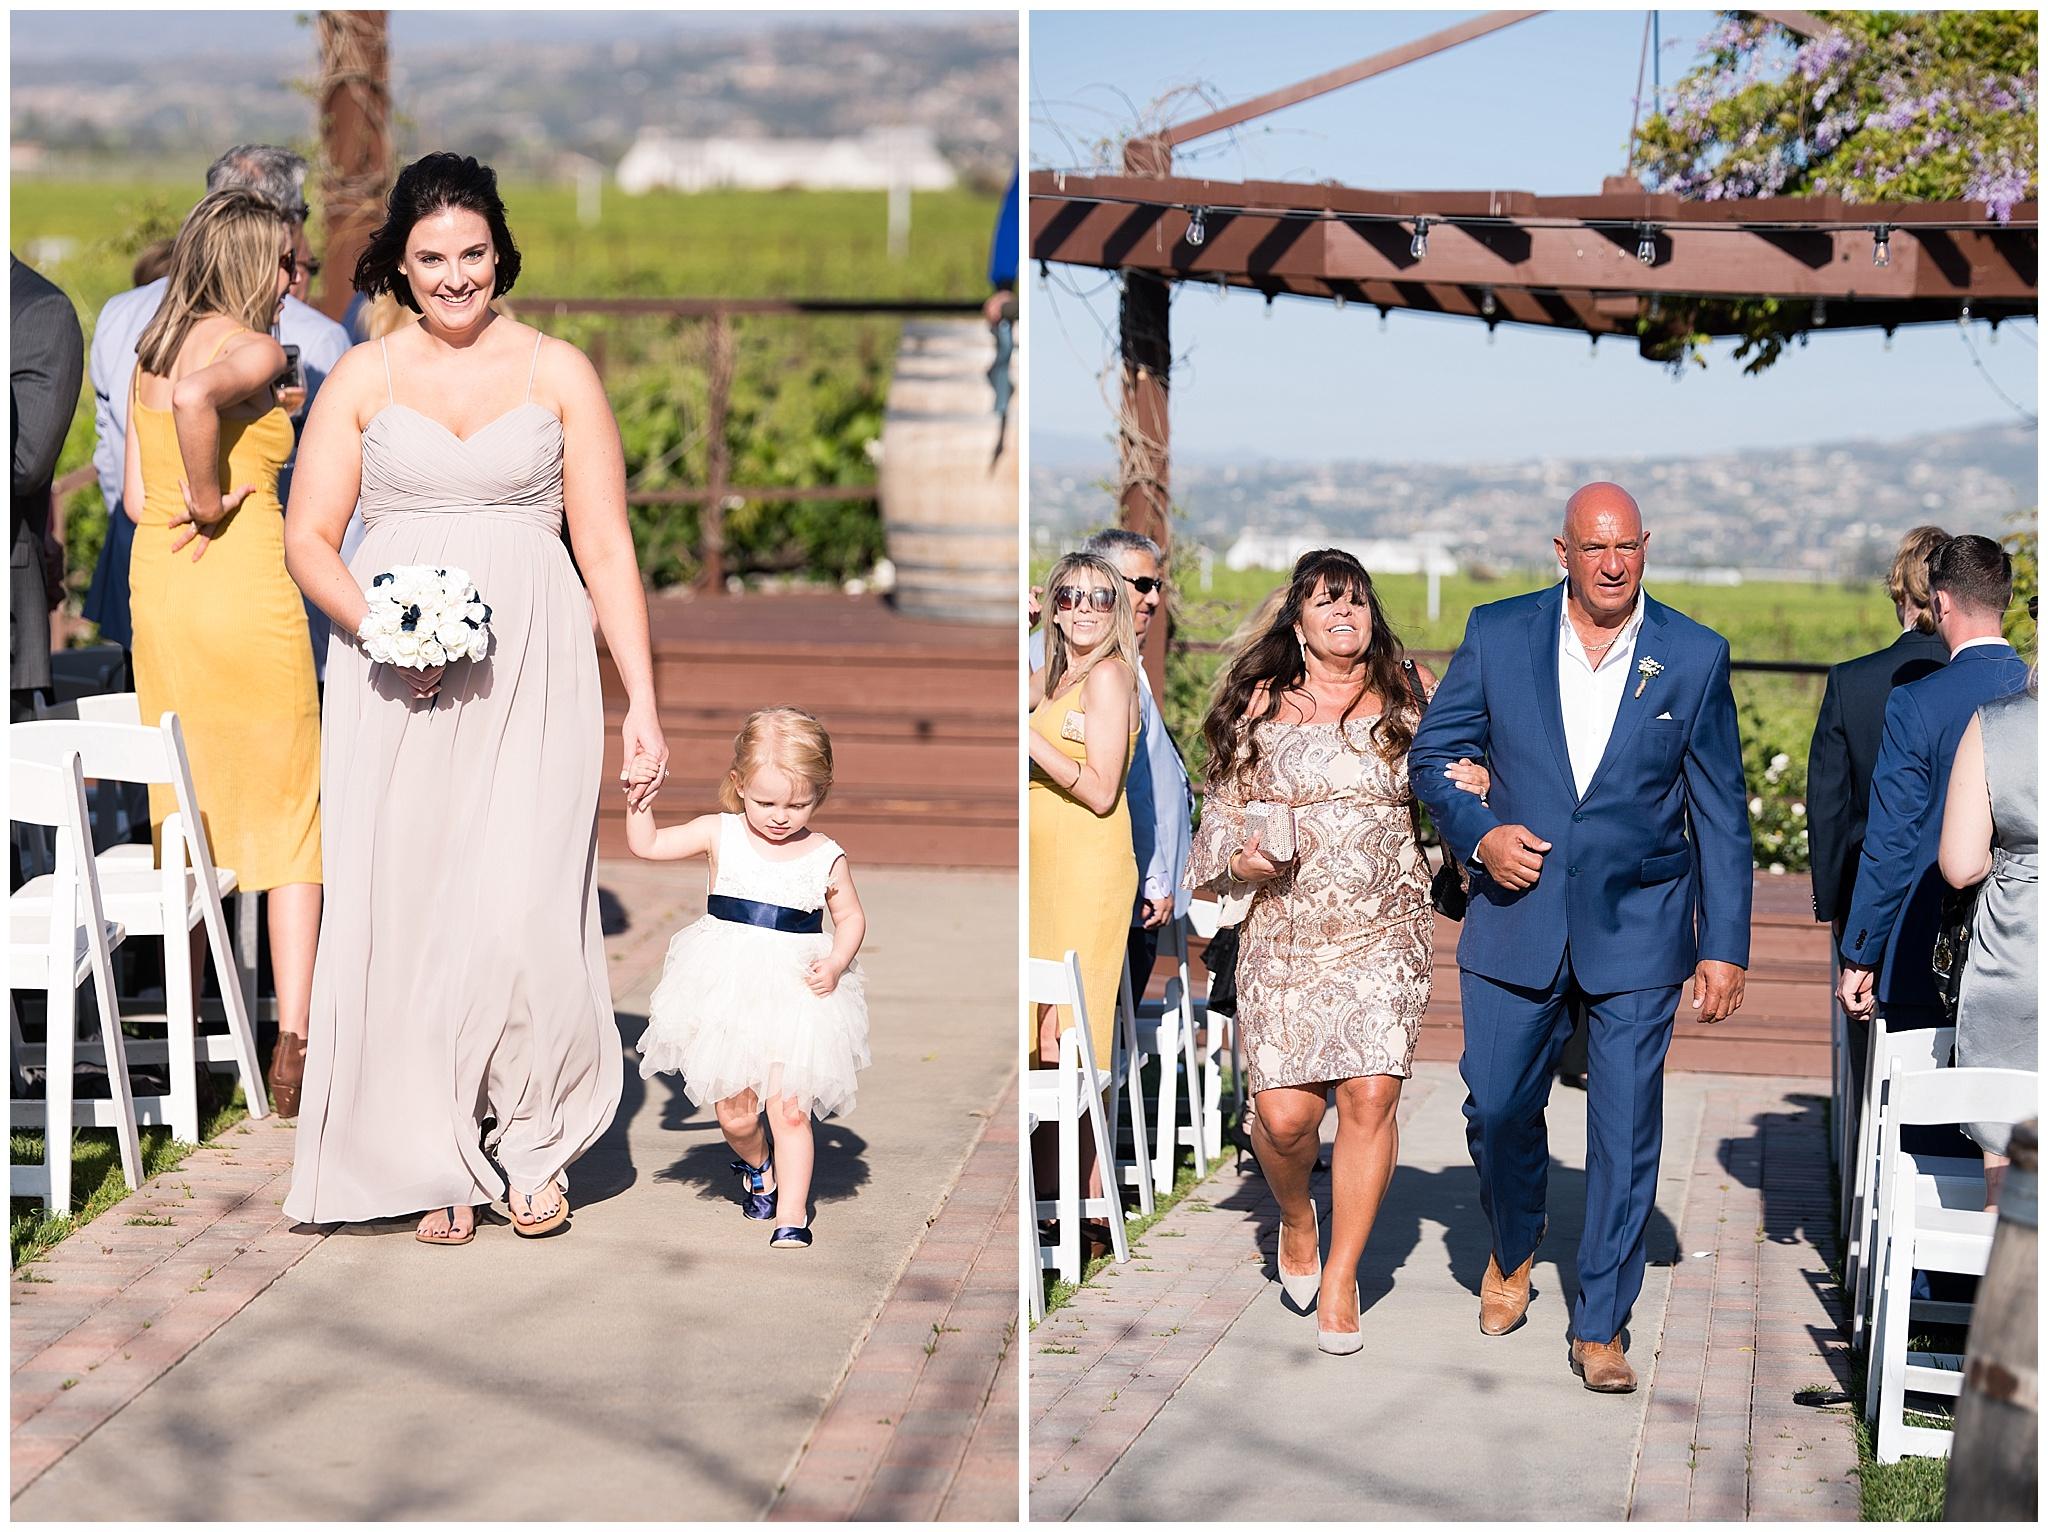 Vinny-Cayt-Wedding-4-26-18-2488.jpg